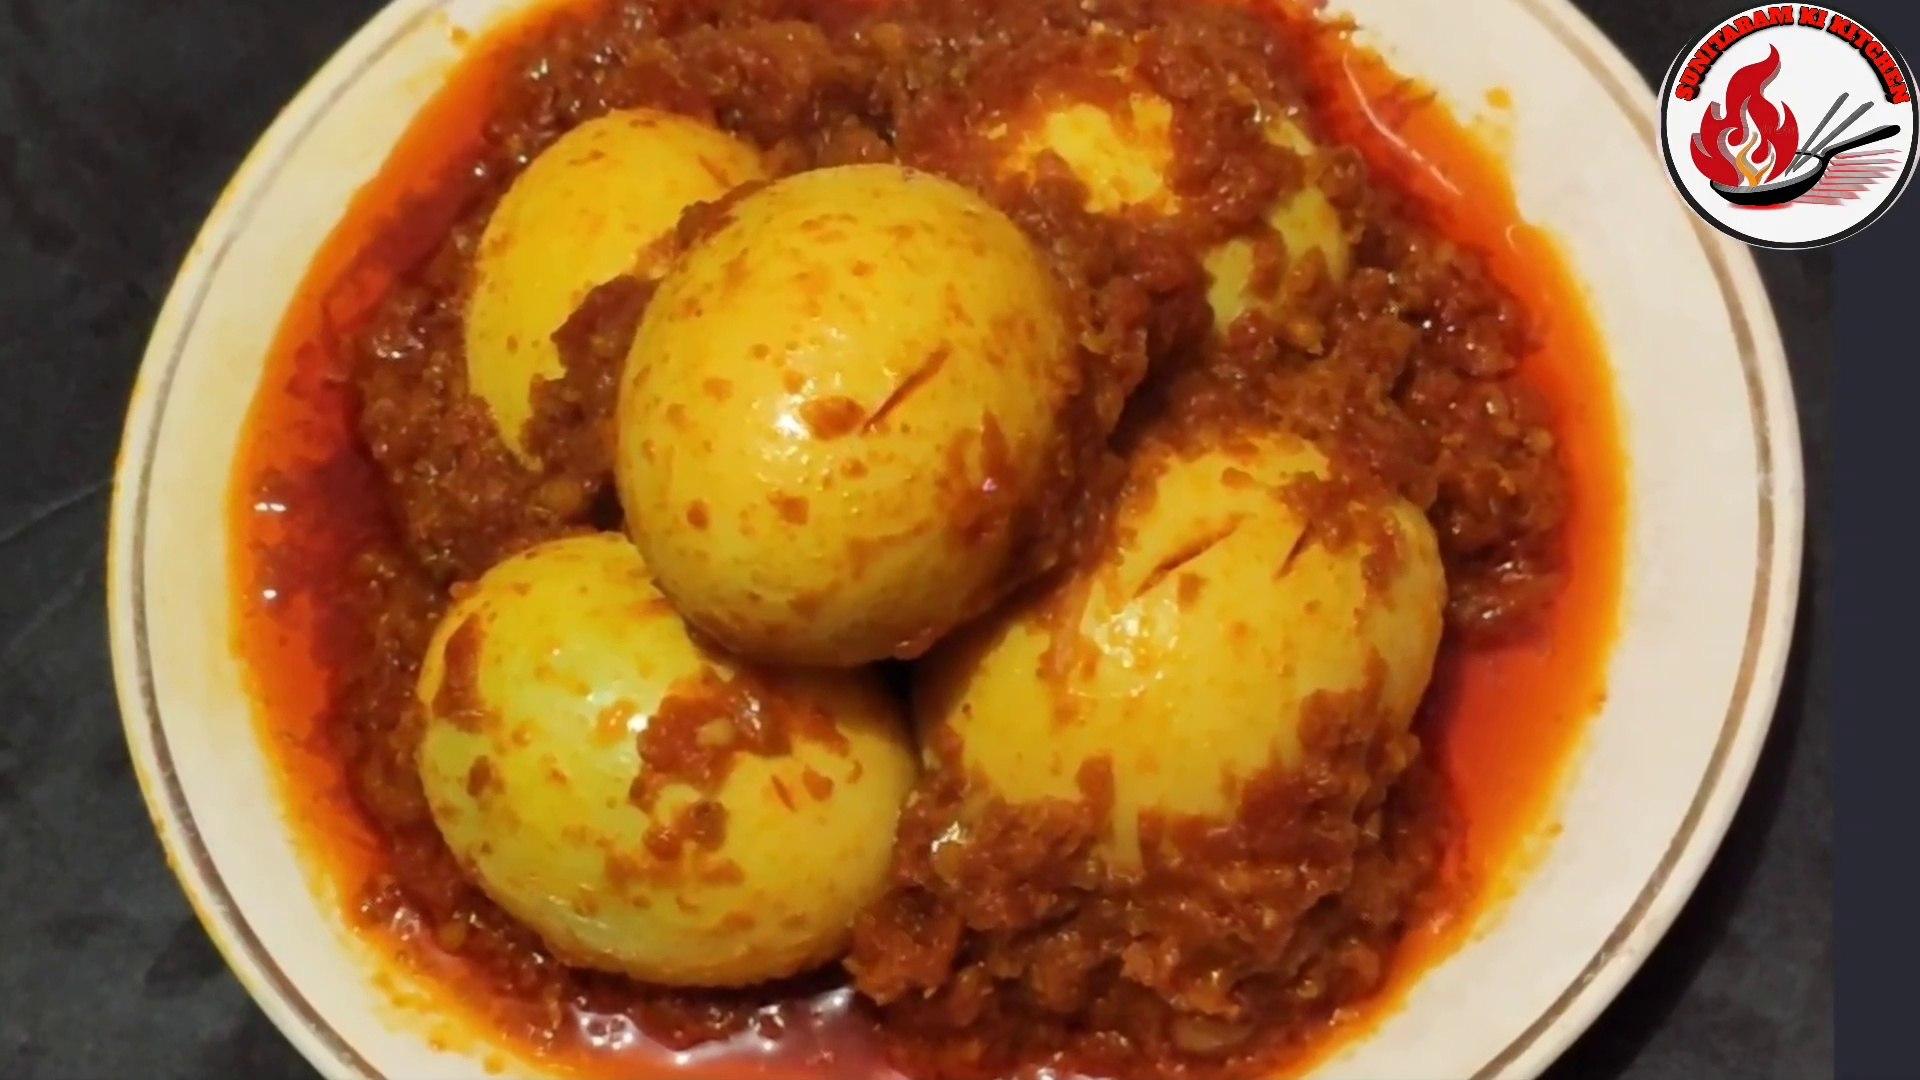 Egg, Curry, Egg curry, Egg curry recipe, Egg curry food fusion, Egg curr, Recipe, Egg recipe, Egg re